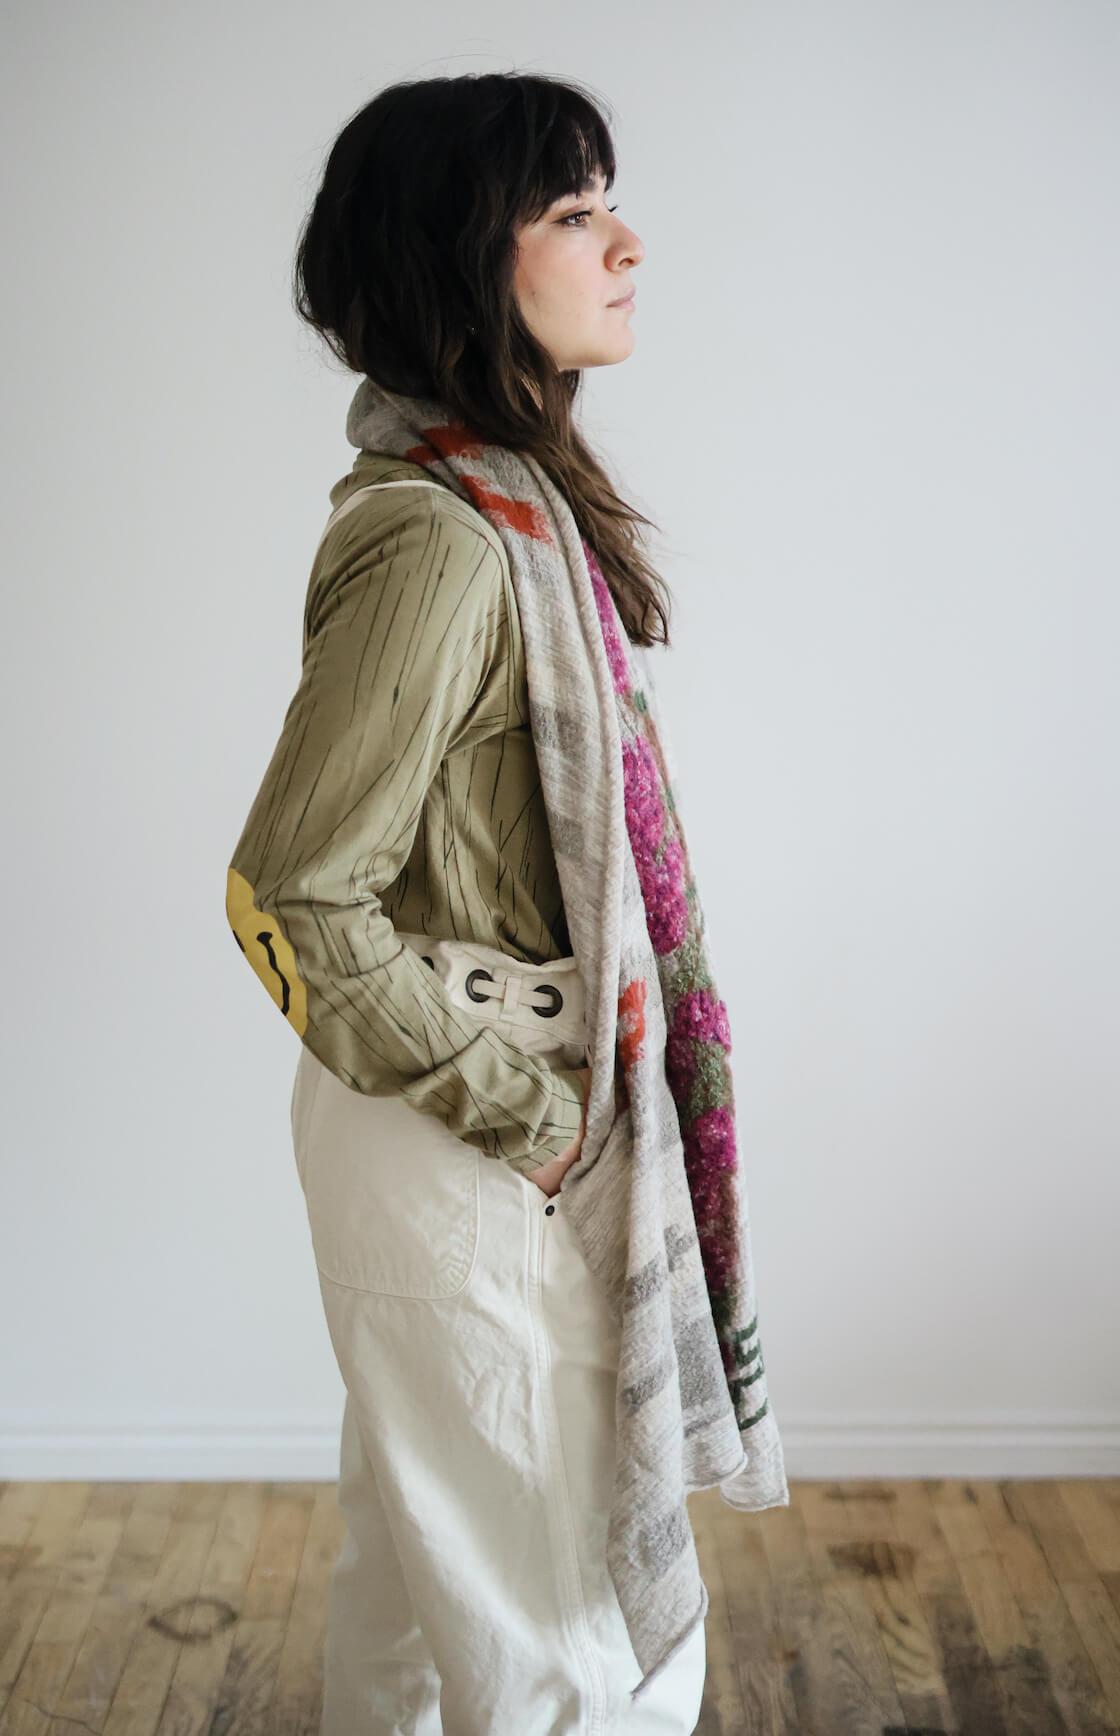 kapital compressed wool scarf on body